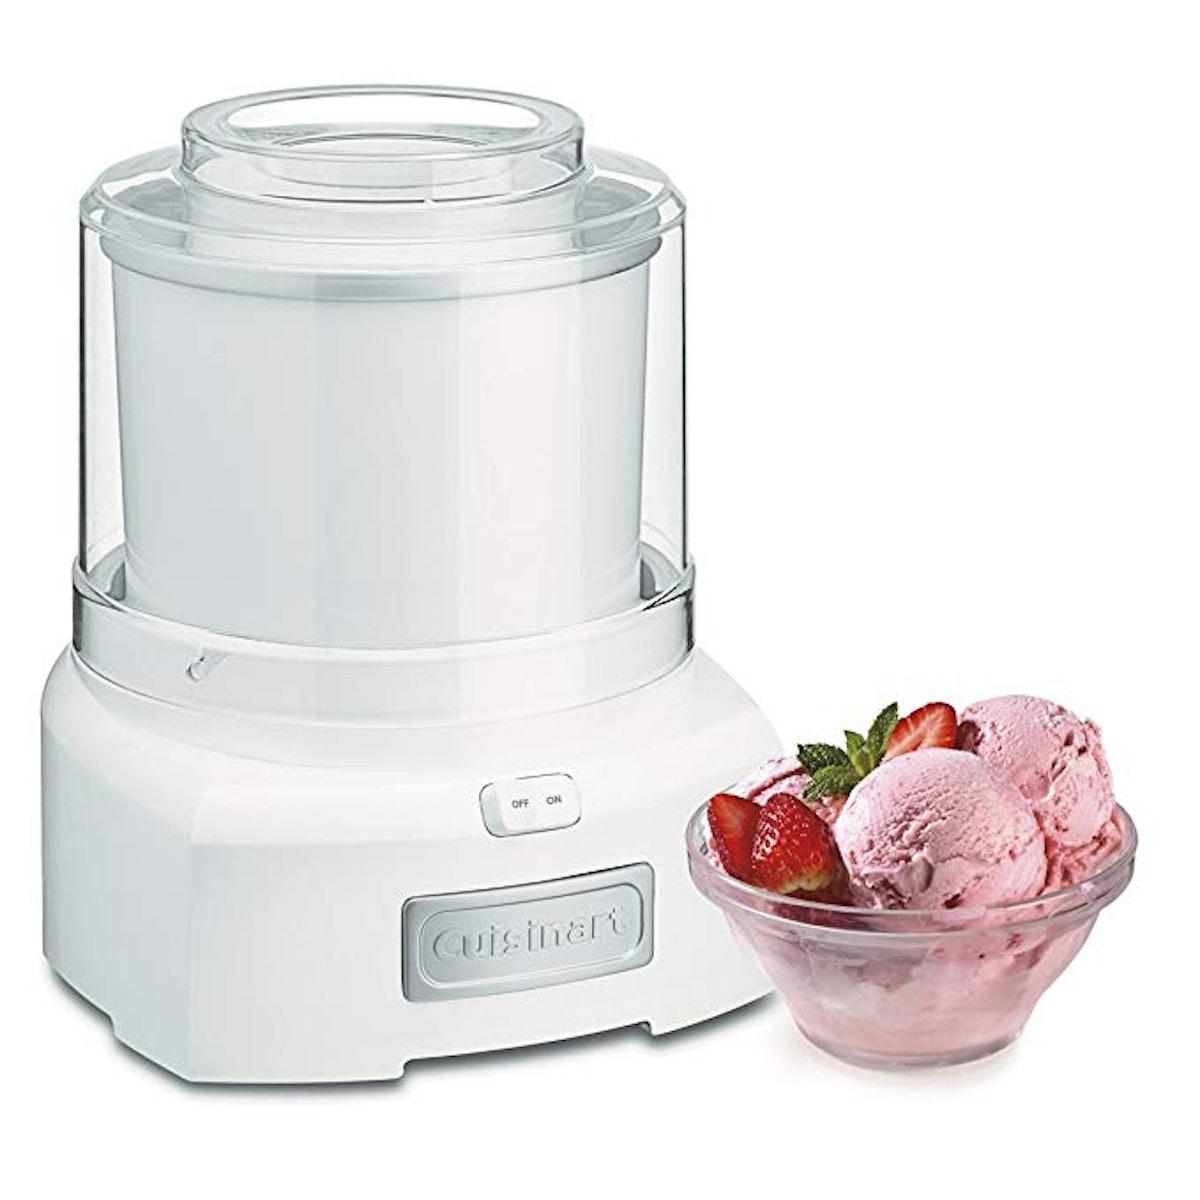 Cuisinart ICE-21 1.5 Quart Frozen Yogurt-Ice Cream Maker